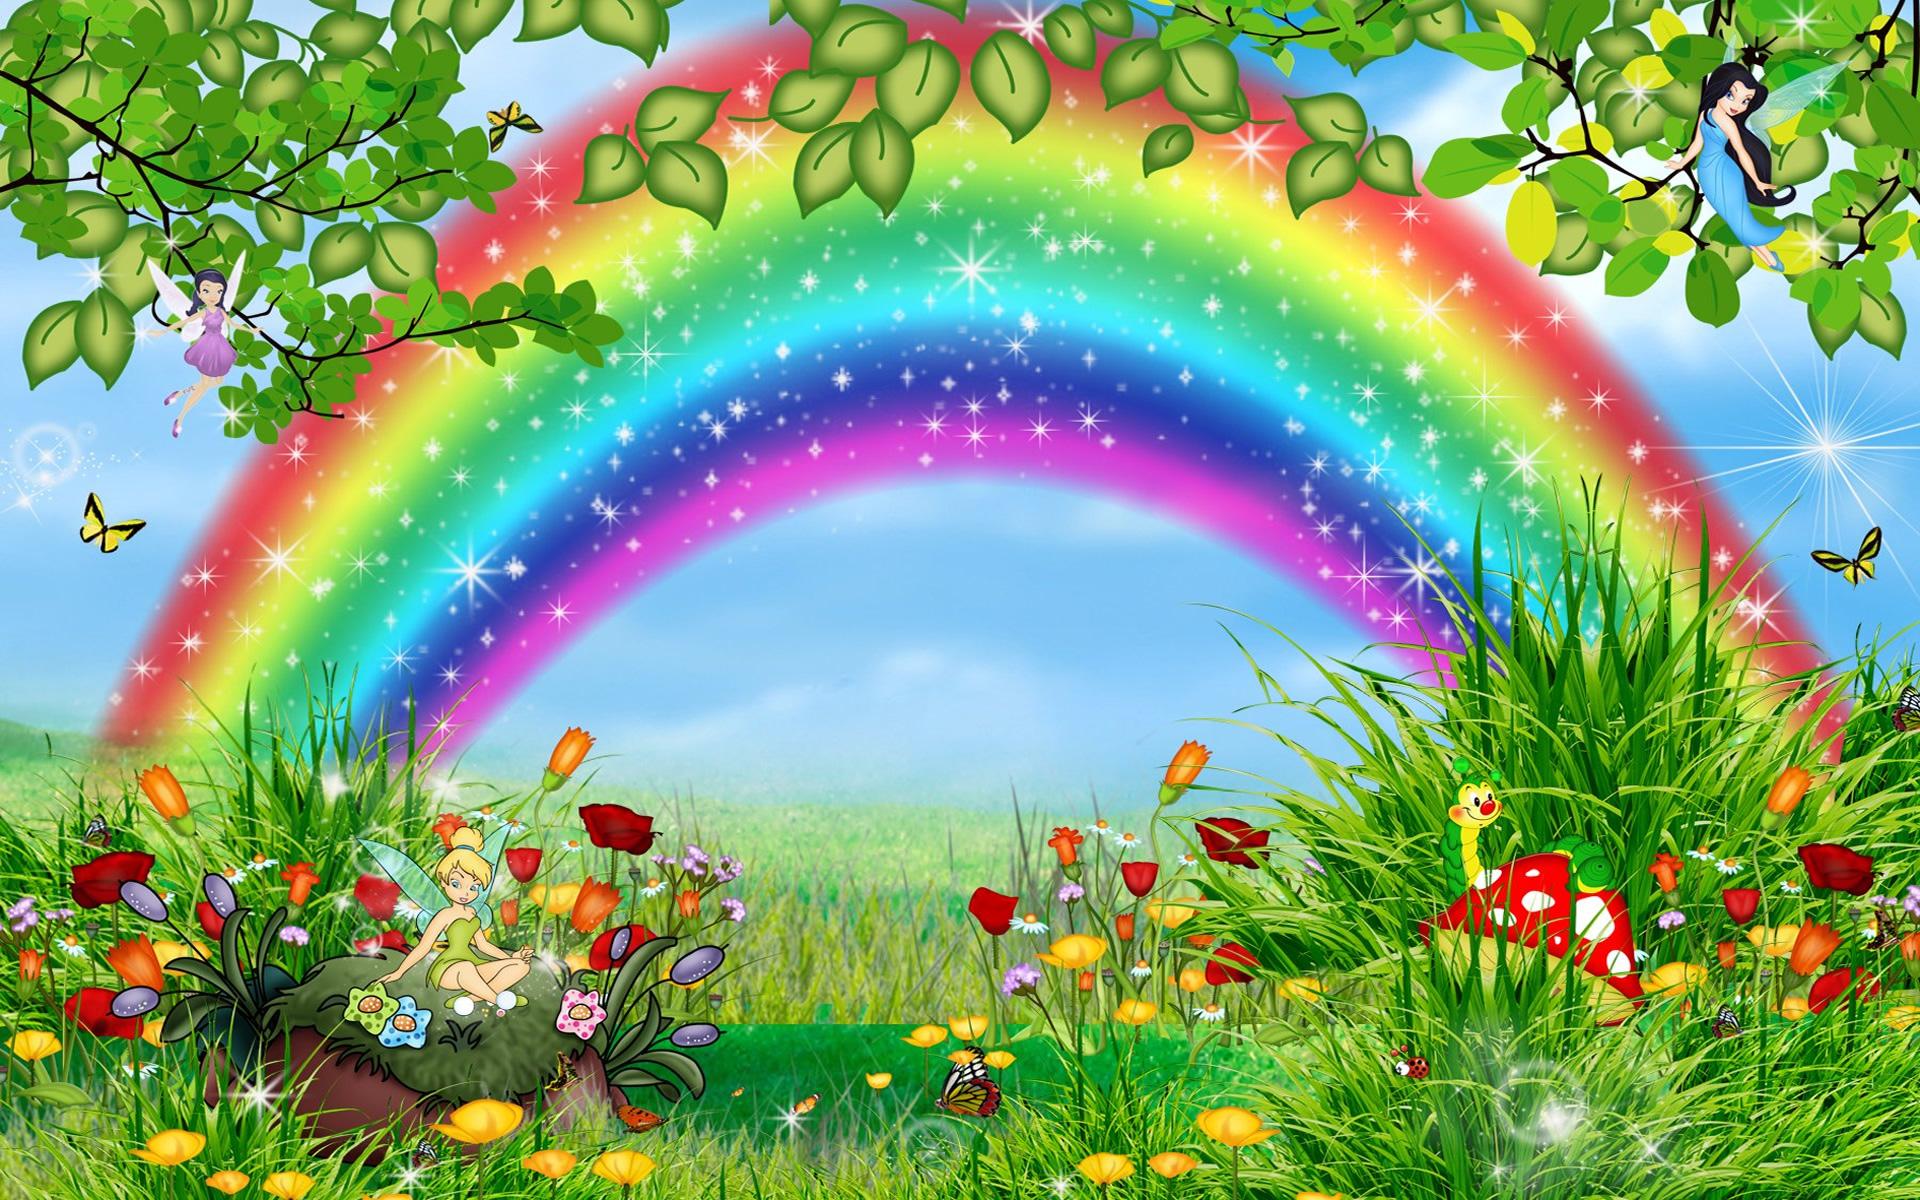 Wallpaper download cartoon - Background Cartoon Rainbow Pictures 10359 Wallpaper Wallpaper Hd